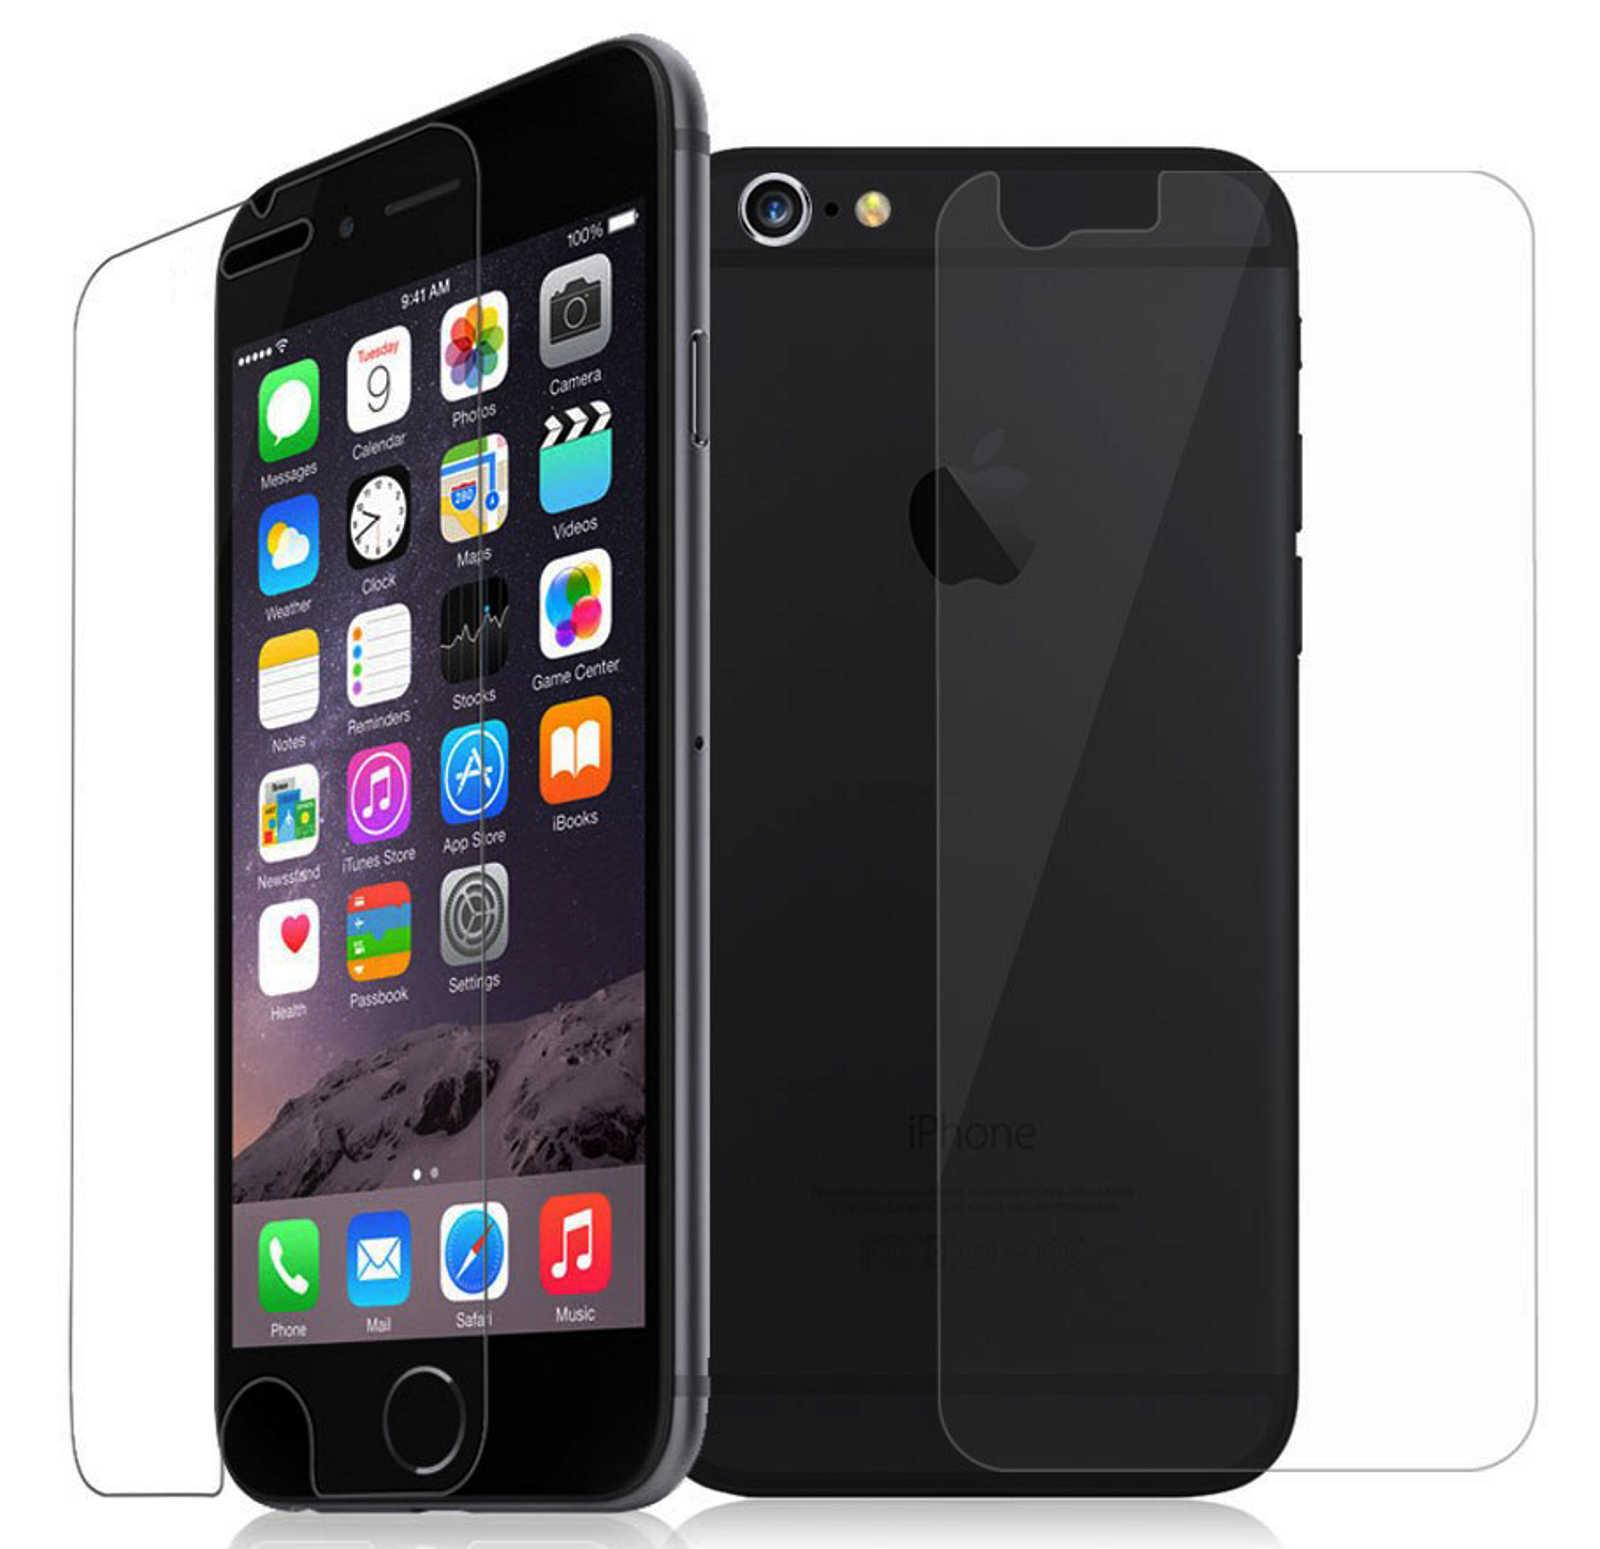 verre tremp apple iphone 6 devant derri re de protection h9 v ritable ebay. Black Bedroom Furniture Sets. Home Design Ideas